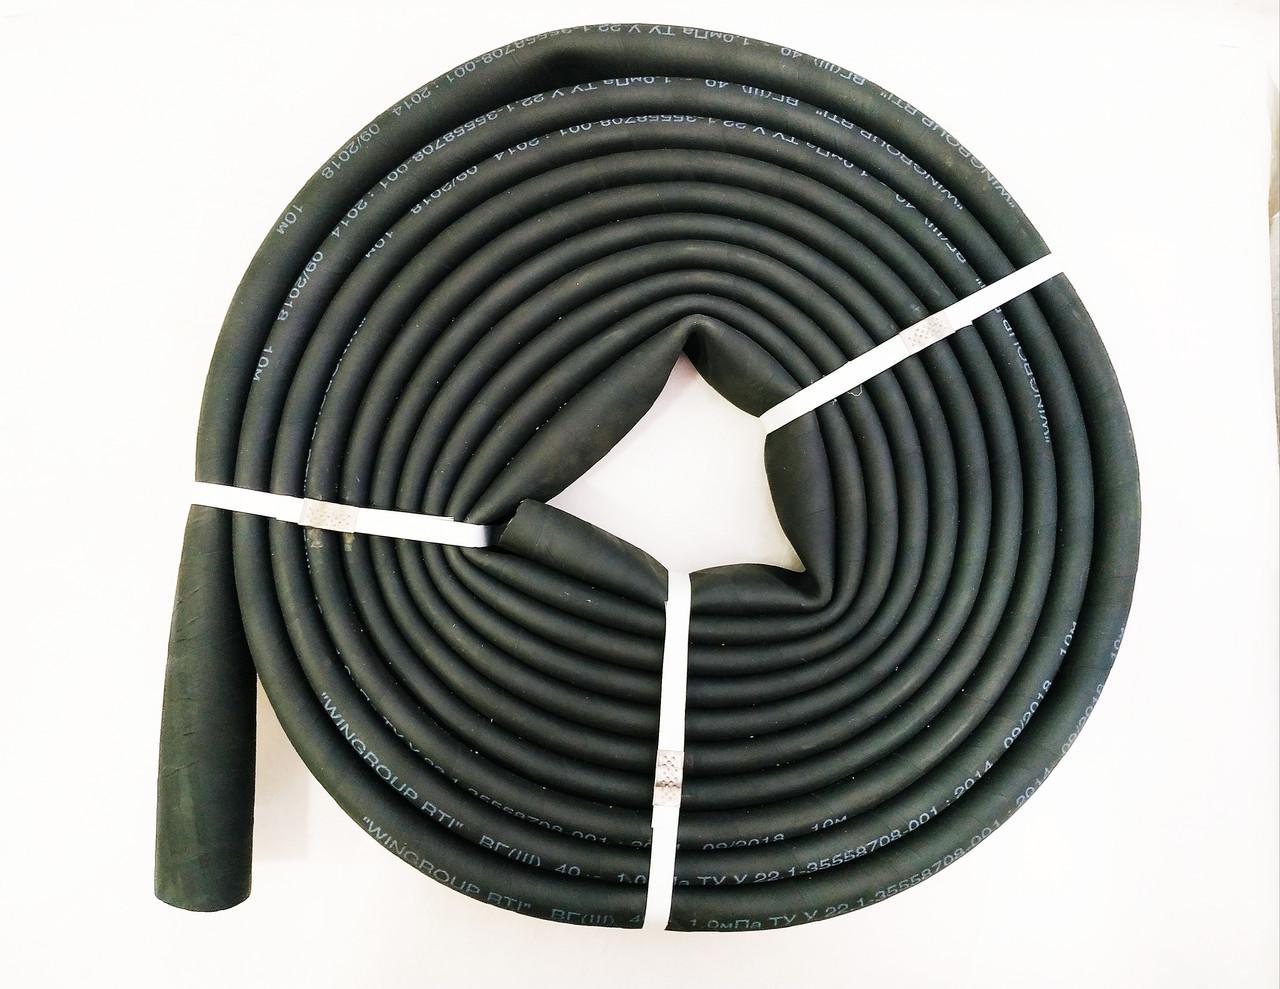 Напорный рукав дорновый Ø 40мм бинтованный  ВГ(ІІІ) техническая вода 10м. Белпромрукав